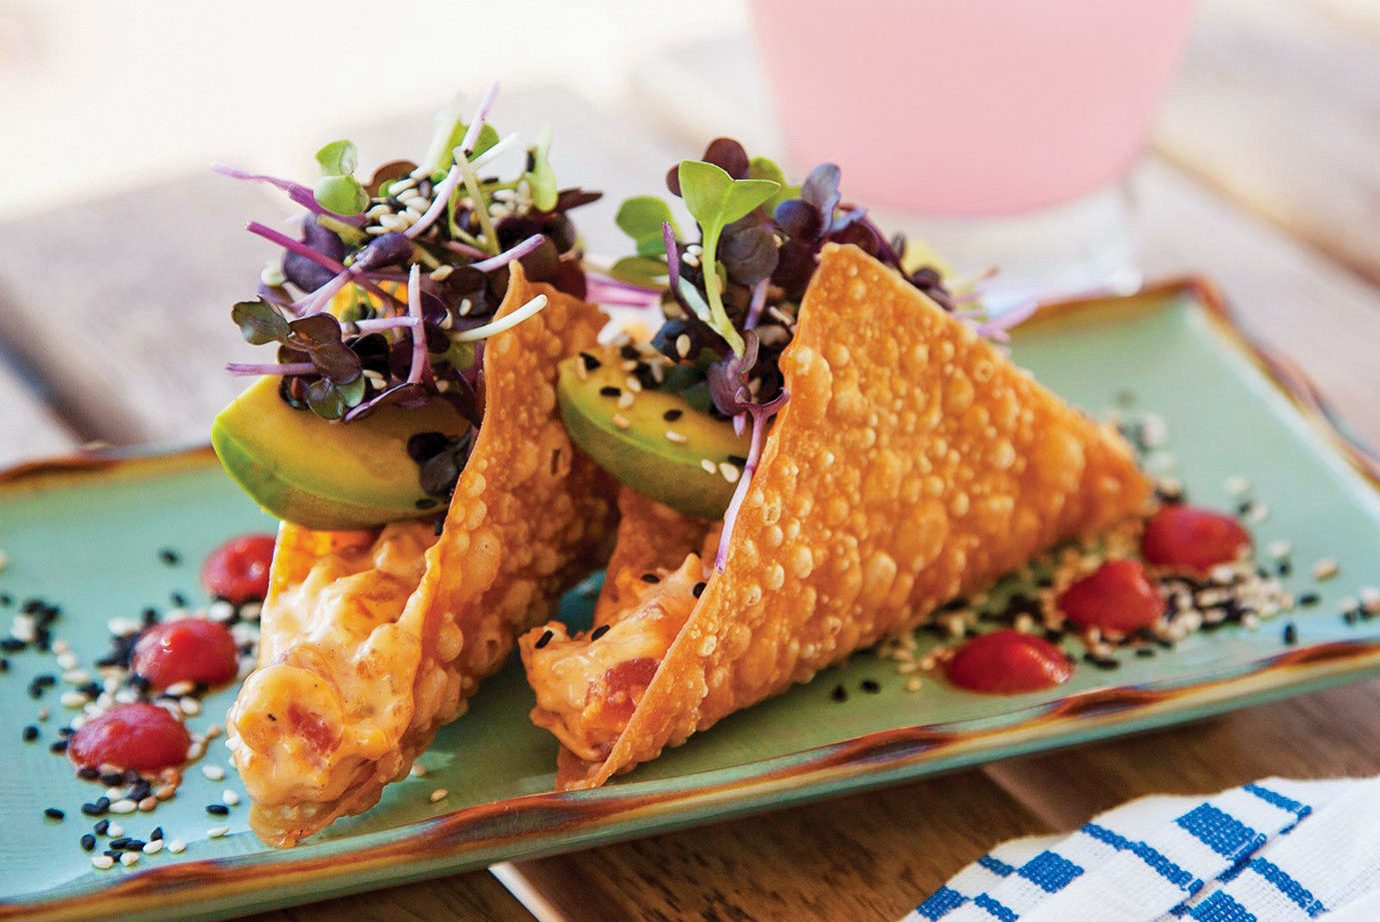 Trip Ideas table food plate dish indoor cuisine vegetarian food appetizer fried food recipe breakfast meal